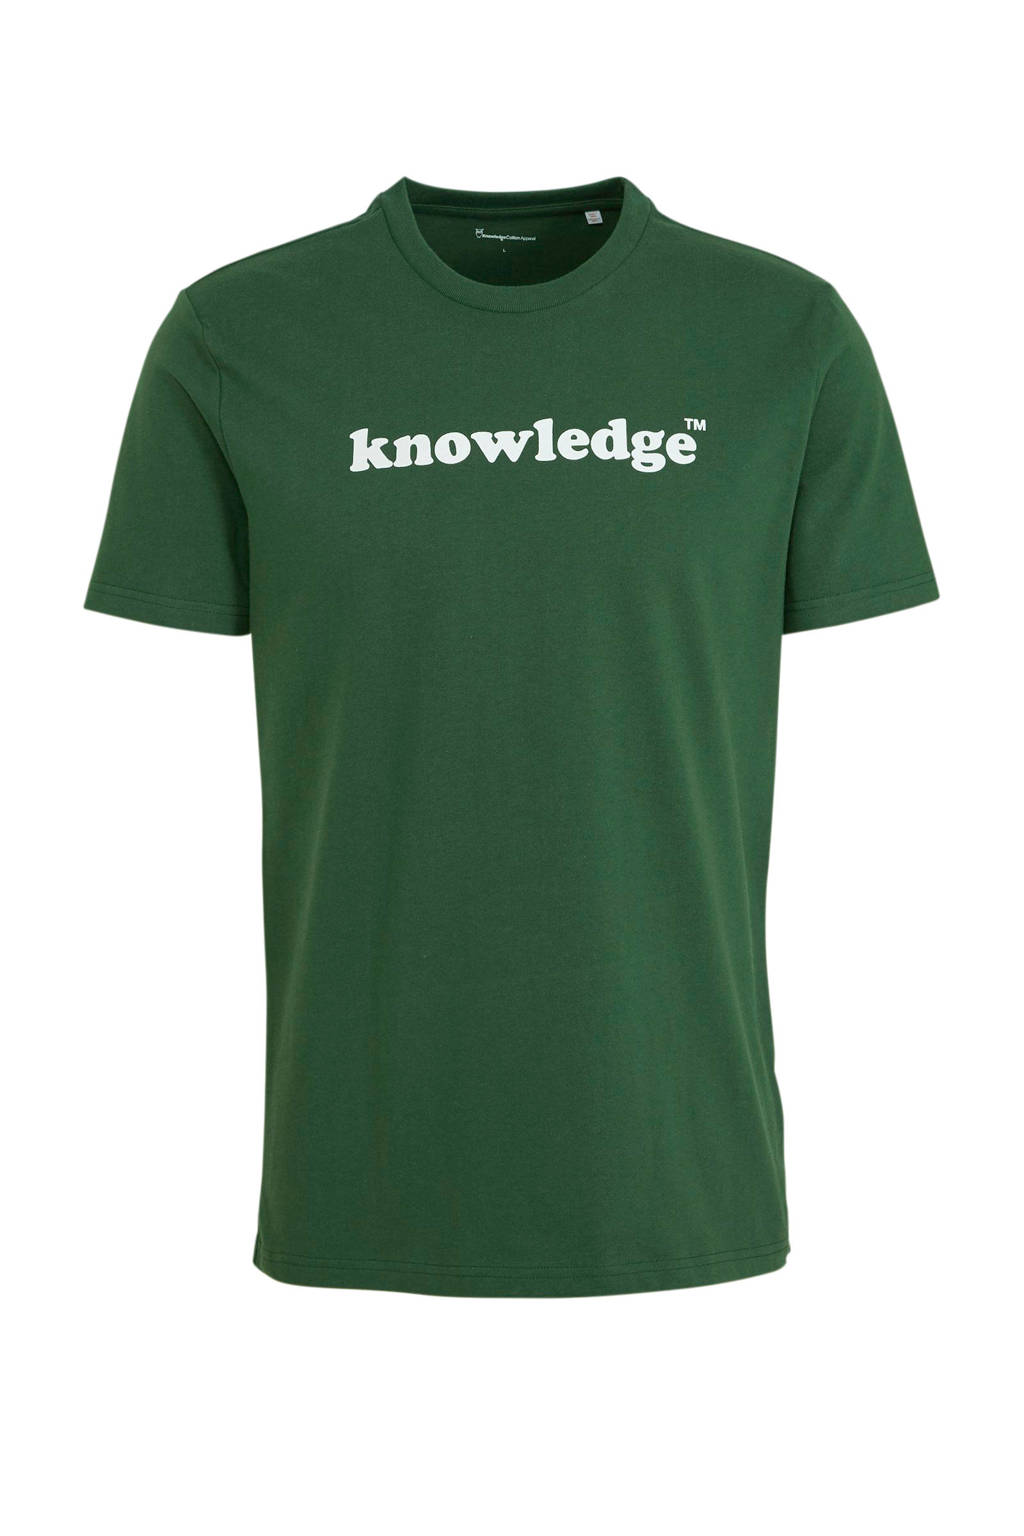 Knowledge Cotton Apparel T-shirt met logo groen, Groen